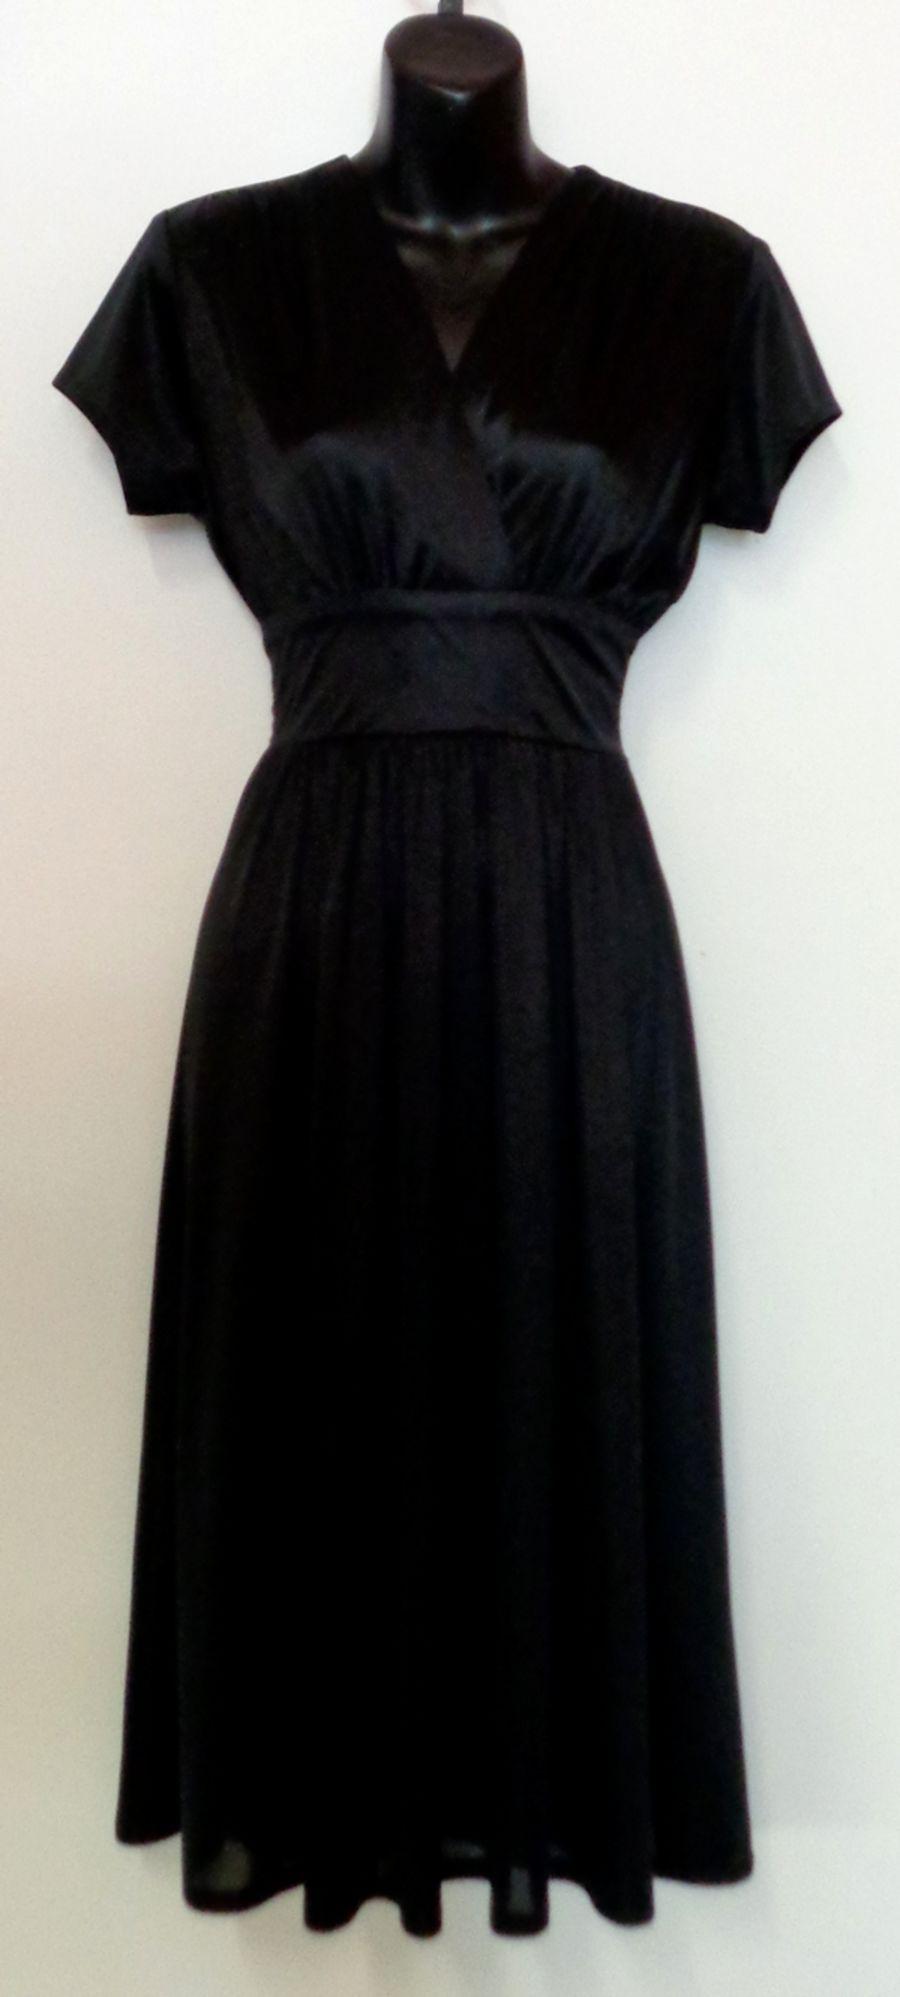 Vintage 1970's Black Empire Line Wrap Midi Disco Dress